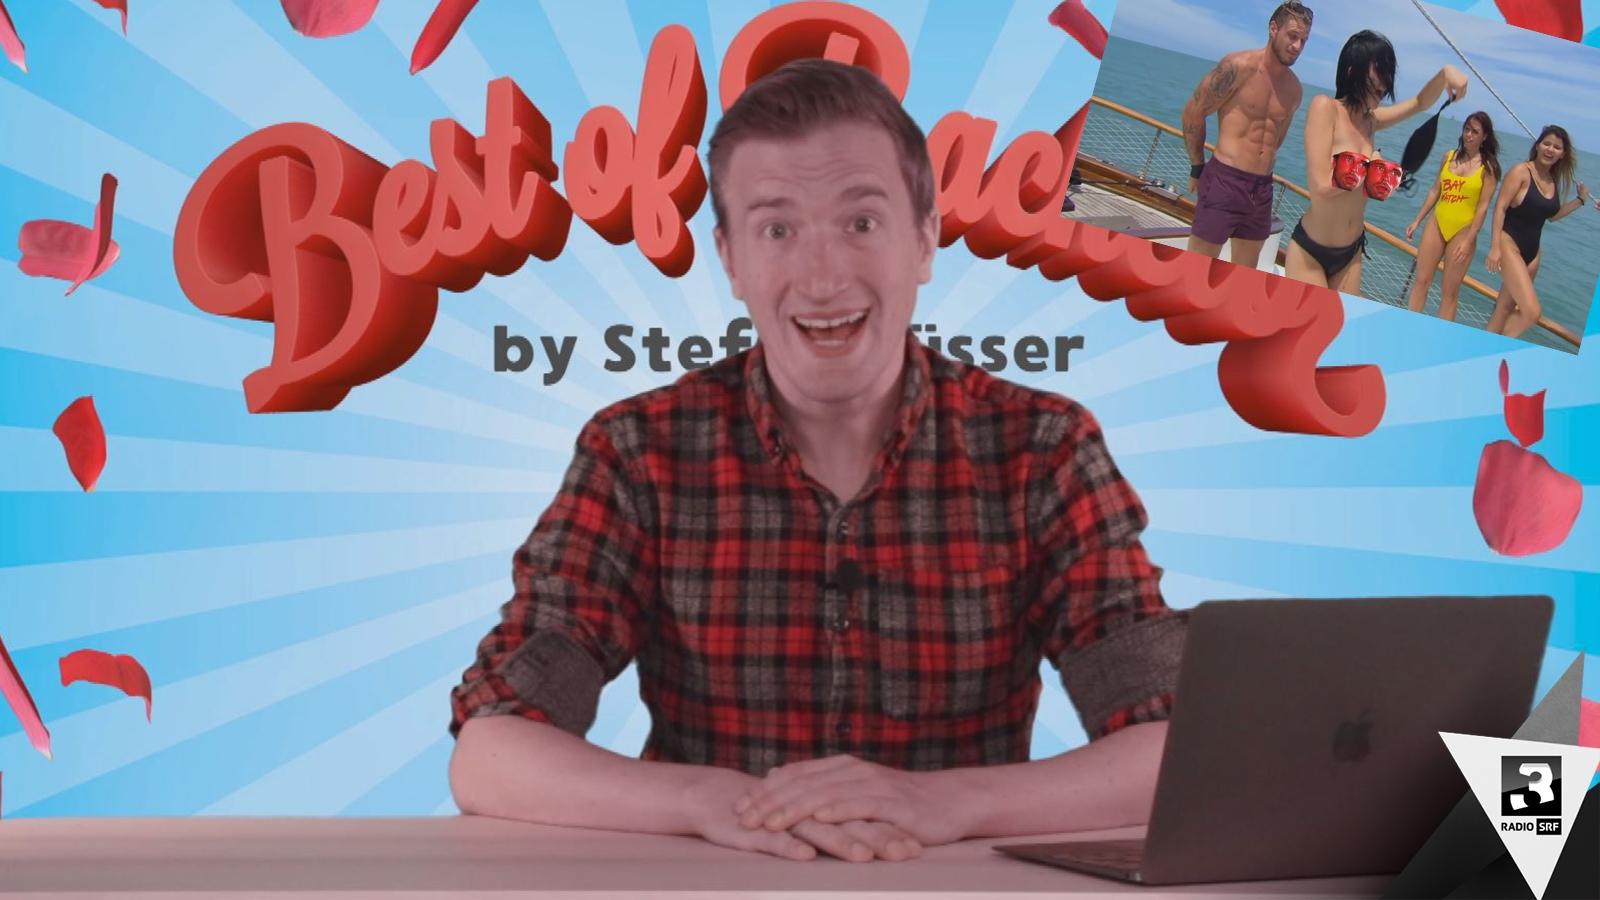 Stefan Büssers Best of Bachelor: Folge 2